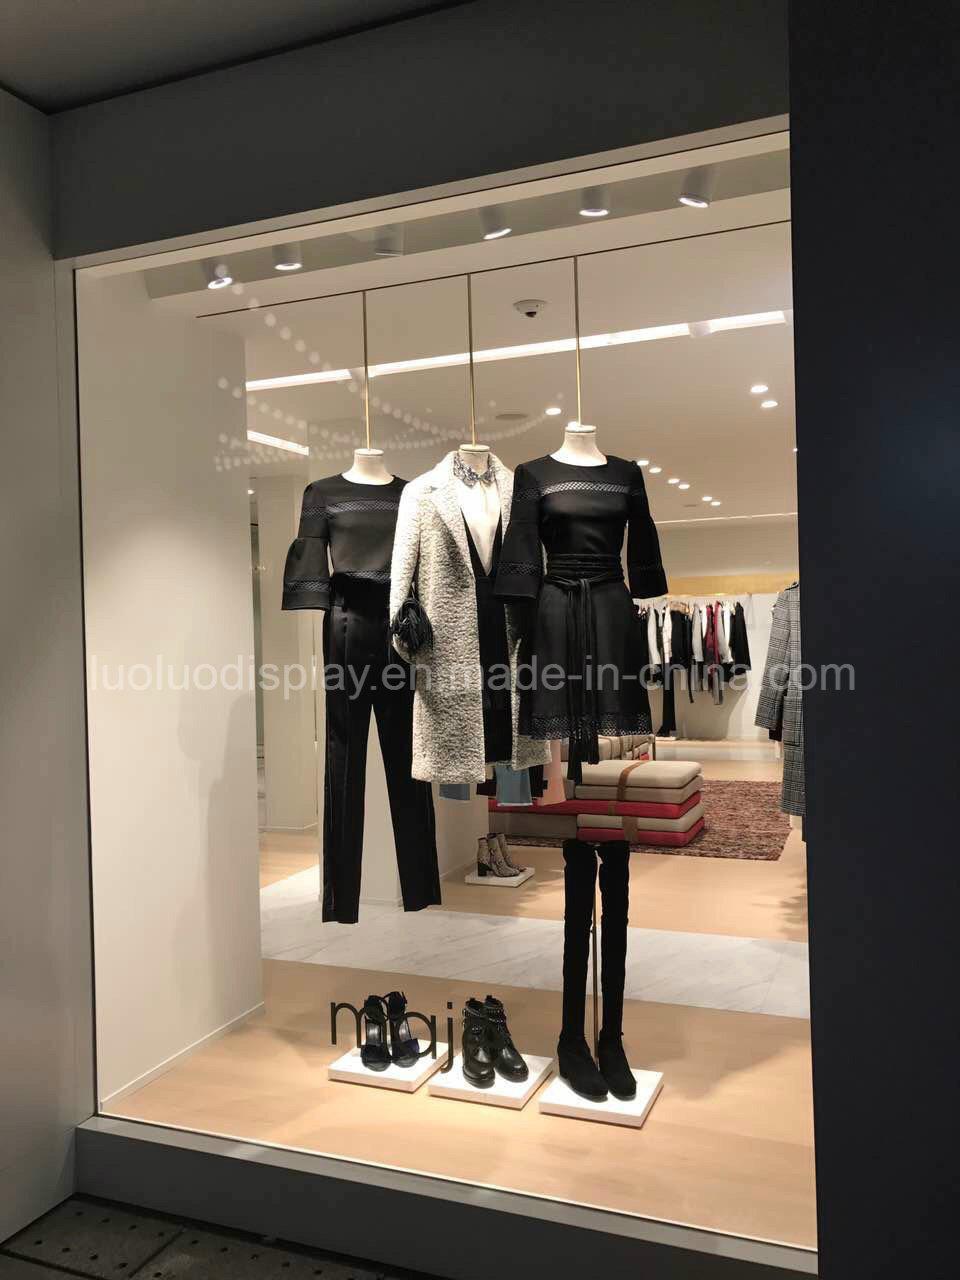 Hot Sale Female Torso Mannequins for Windows Display